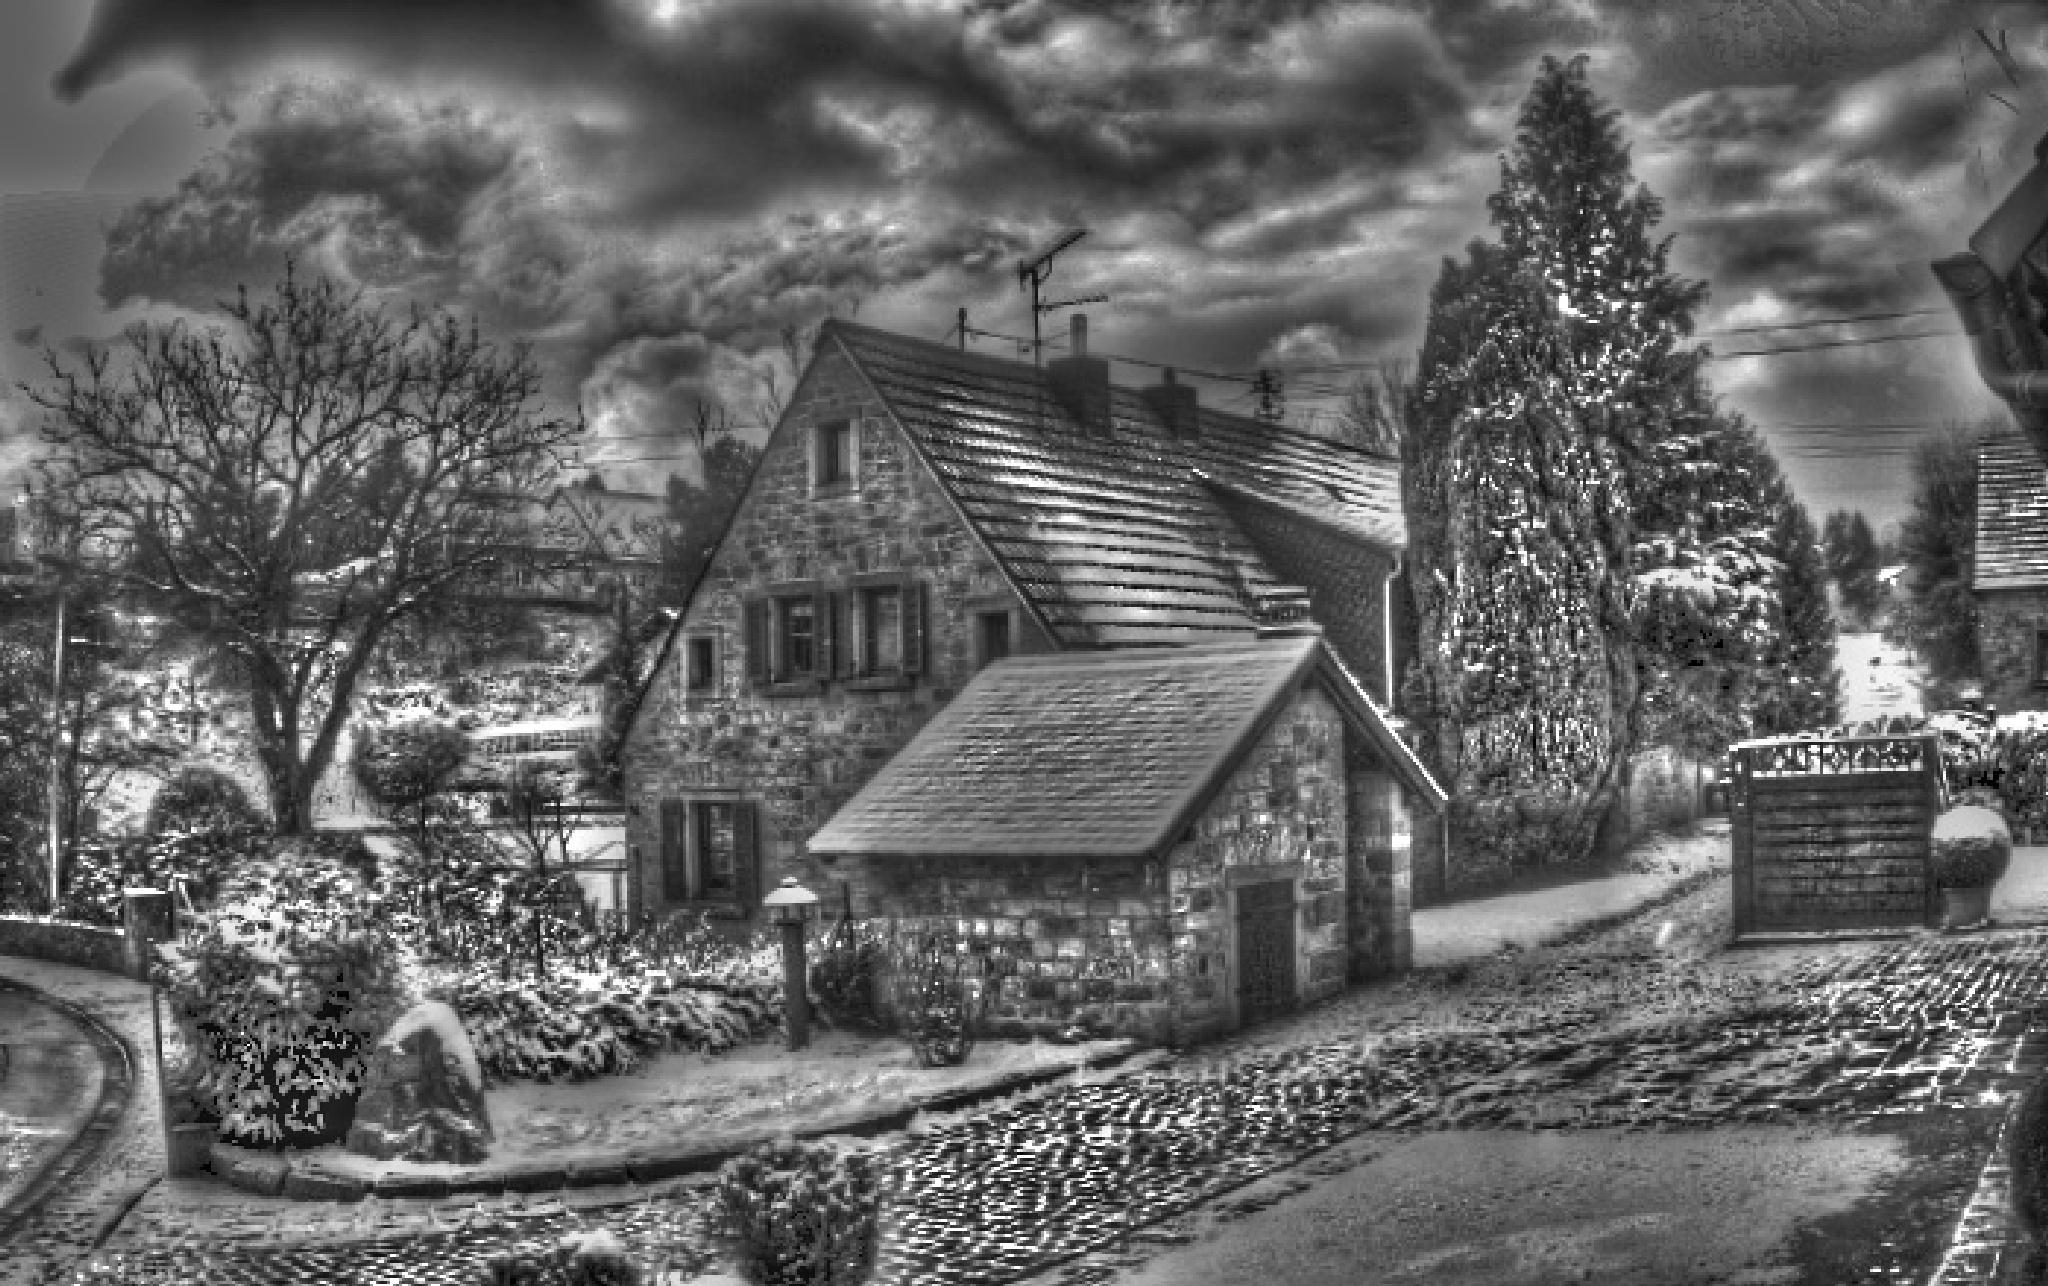 Home sweet home, by Antoni Marek Polczyk